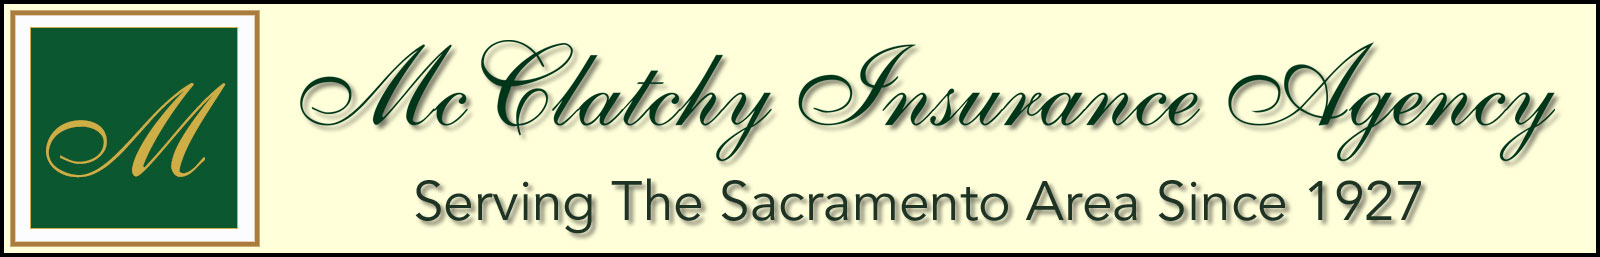 McClatchy Insurance Agency Sacramento